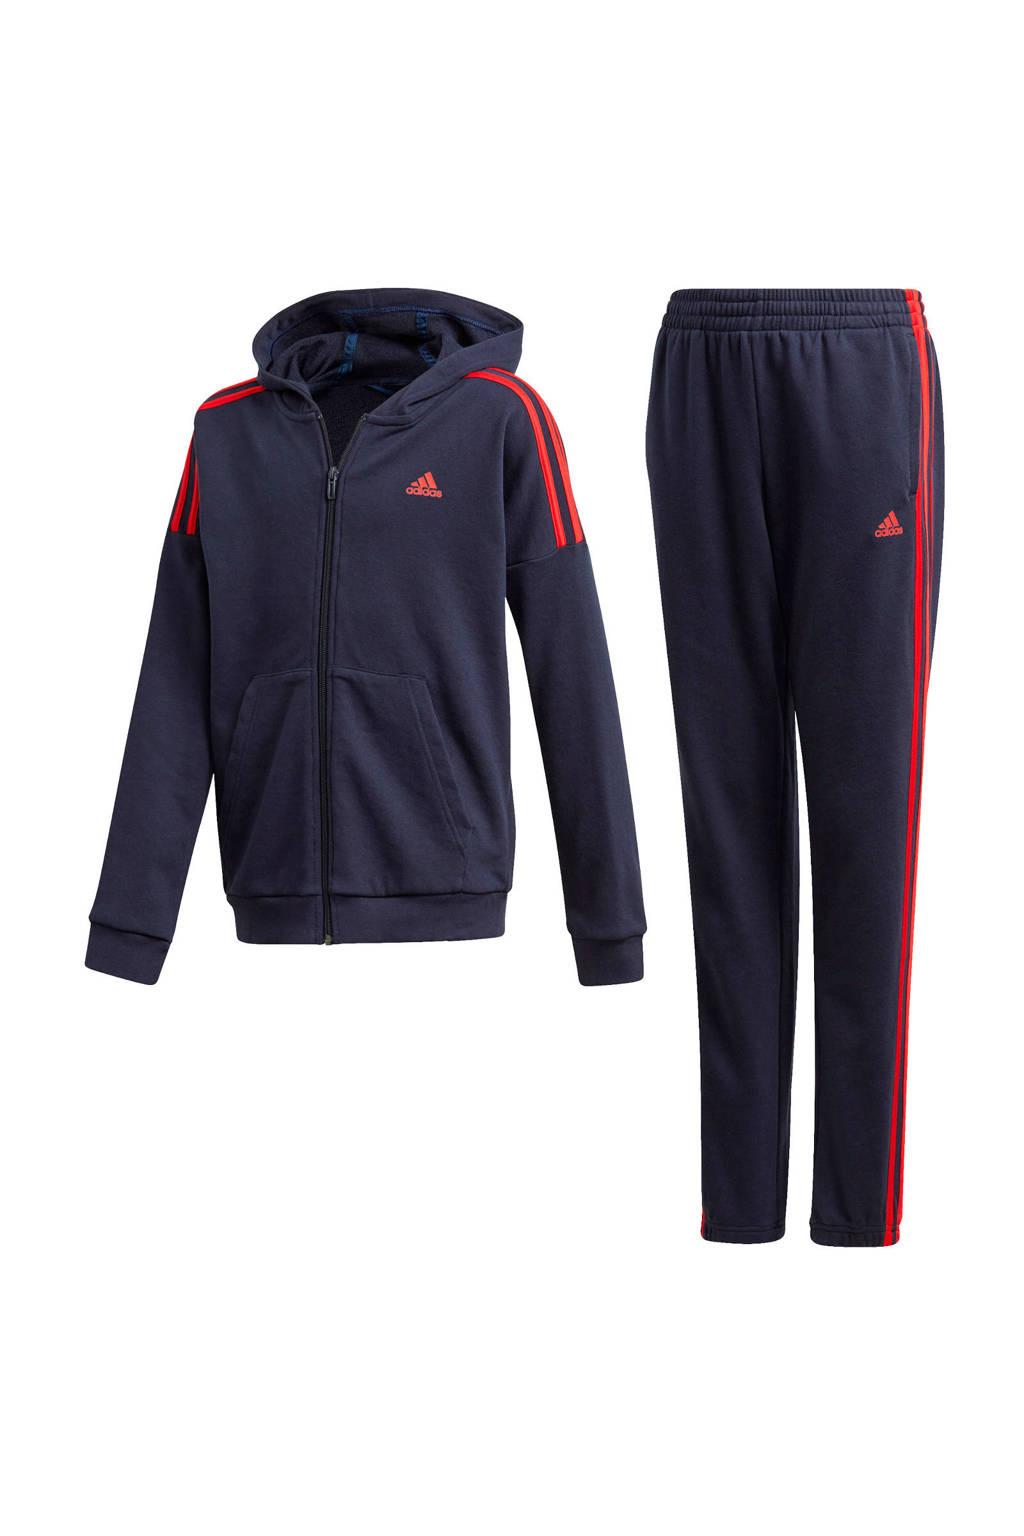 adidas Performance   joggingpak donkerblauw/rood, Donkerblauw/rood